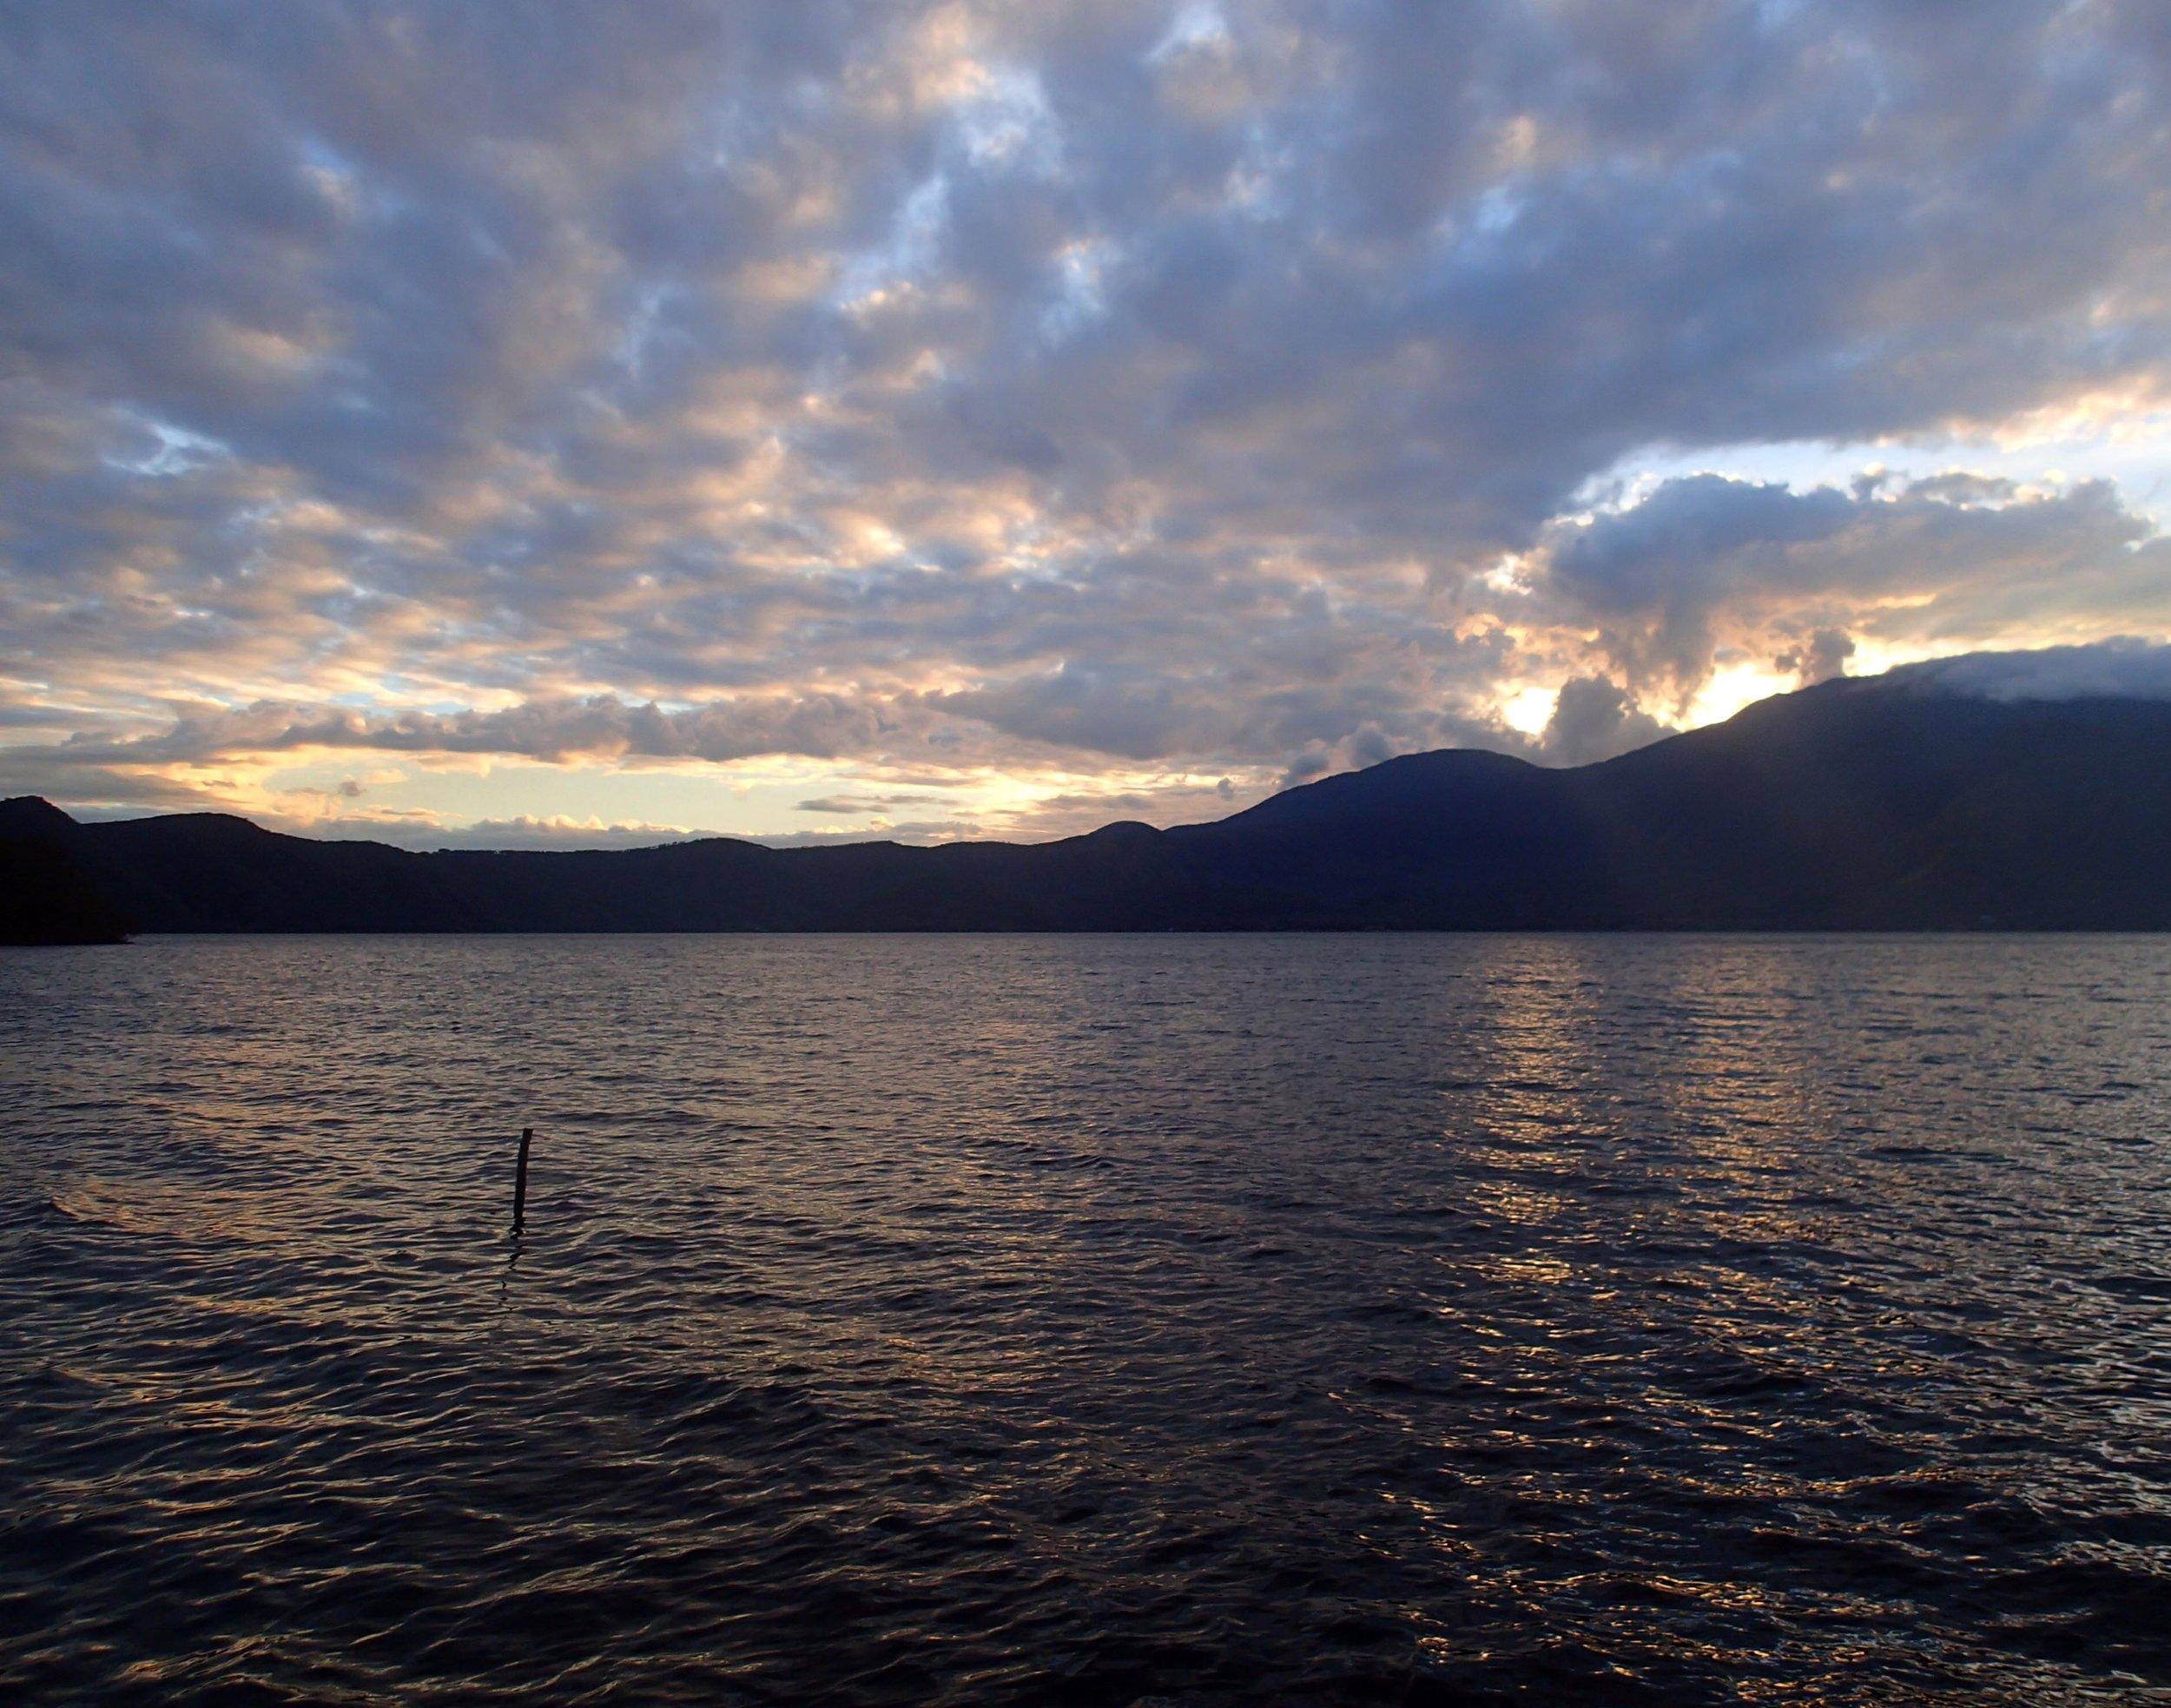 2014-12-13 sunset.jpg